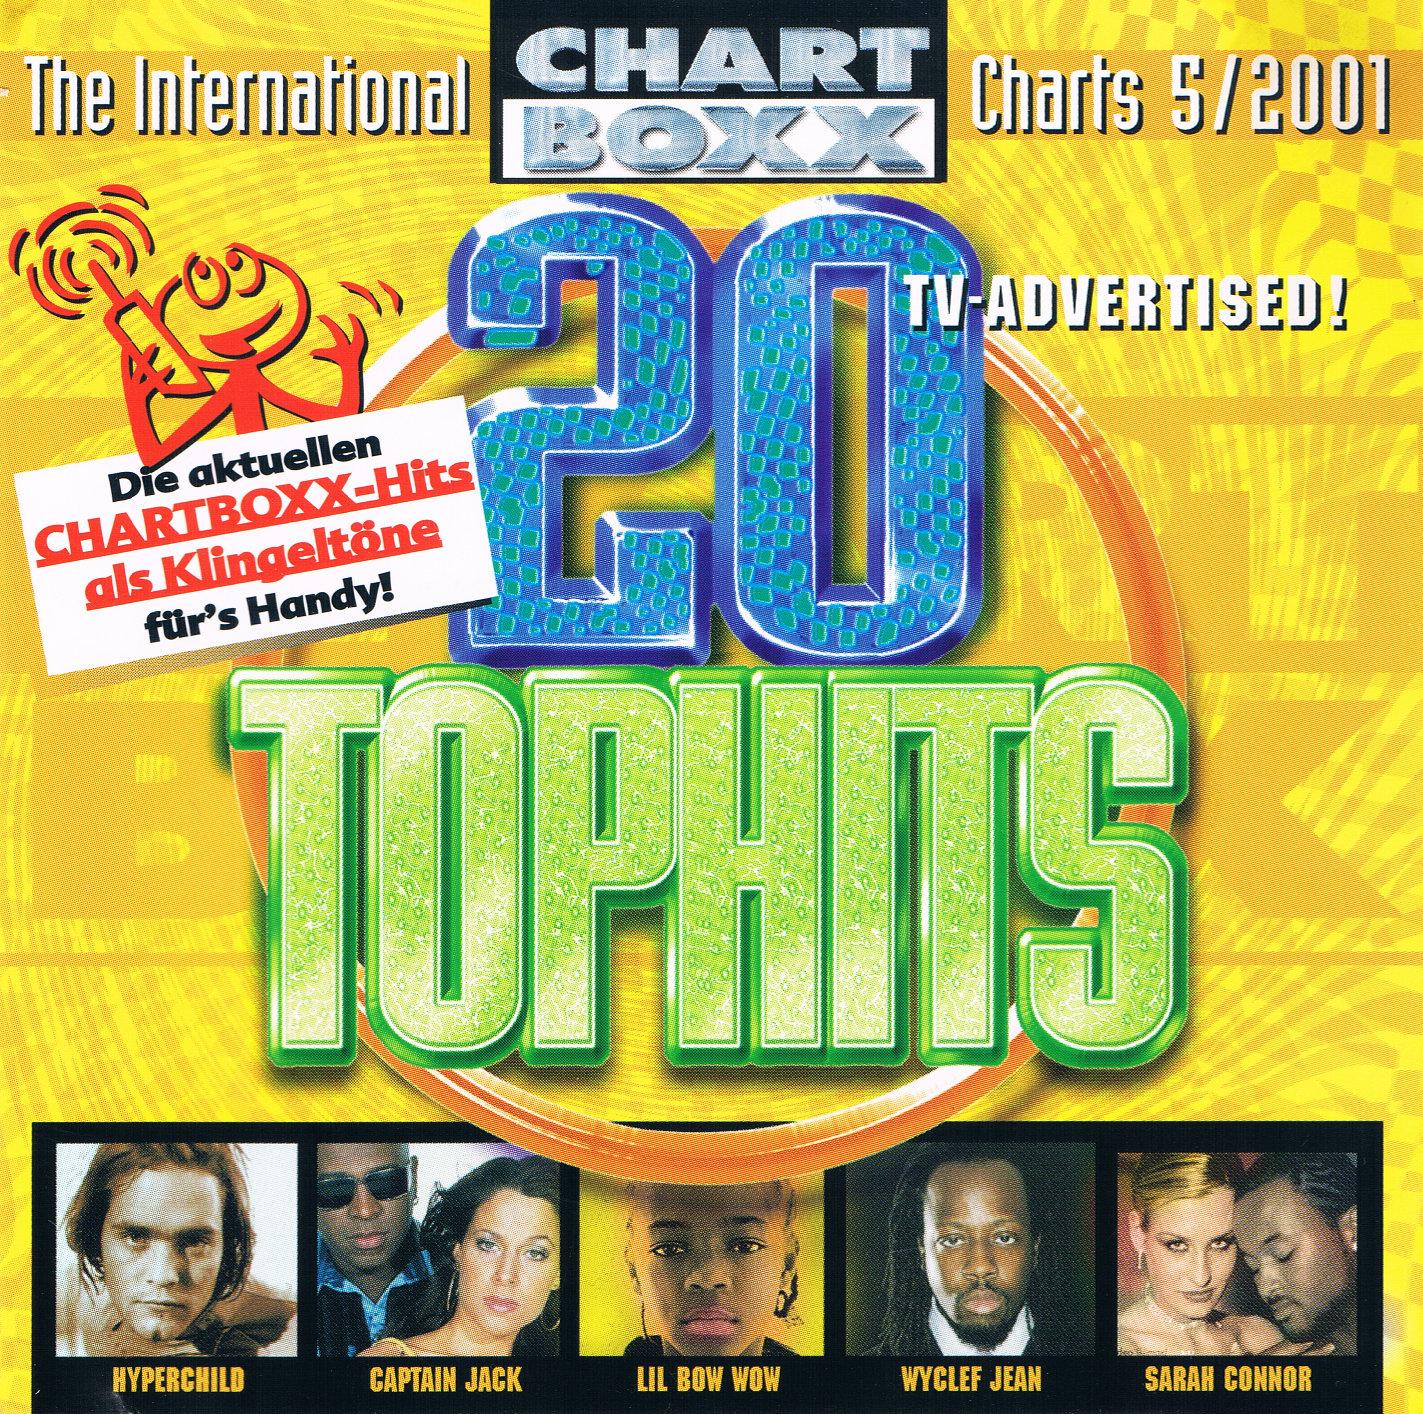 ChartBoxx 200105   CD (2001, Multimedia)